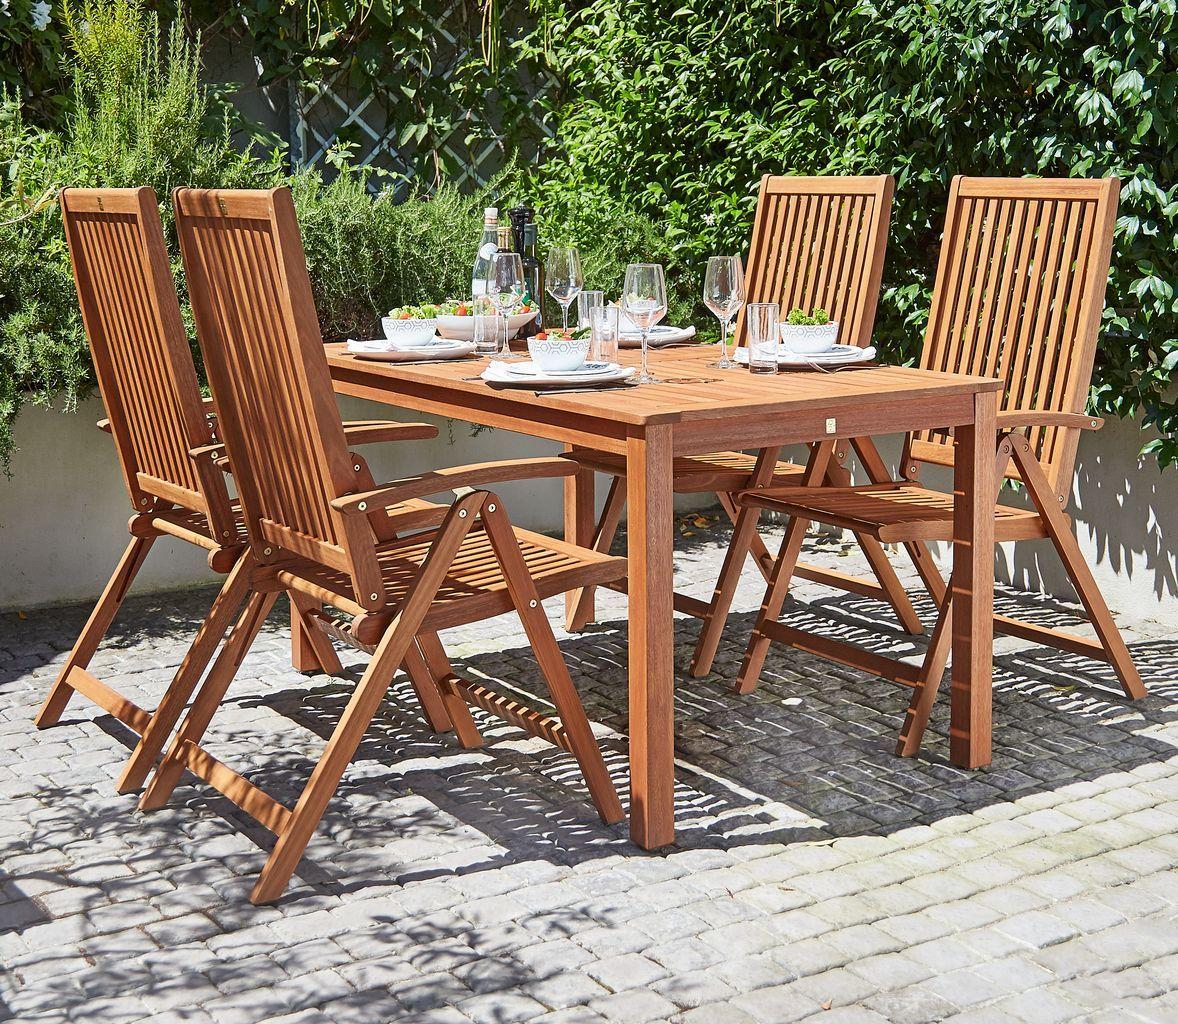 Table Hamar L150 4 Rec Chairs Kamstrup Jysk Bord Sommerhus